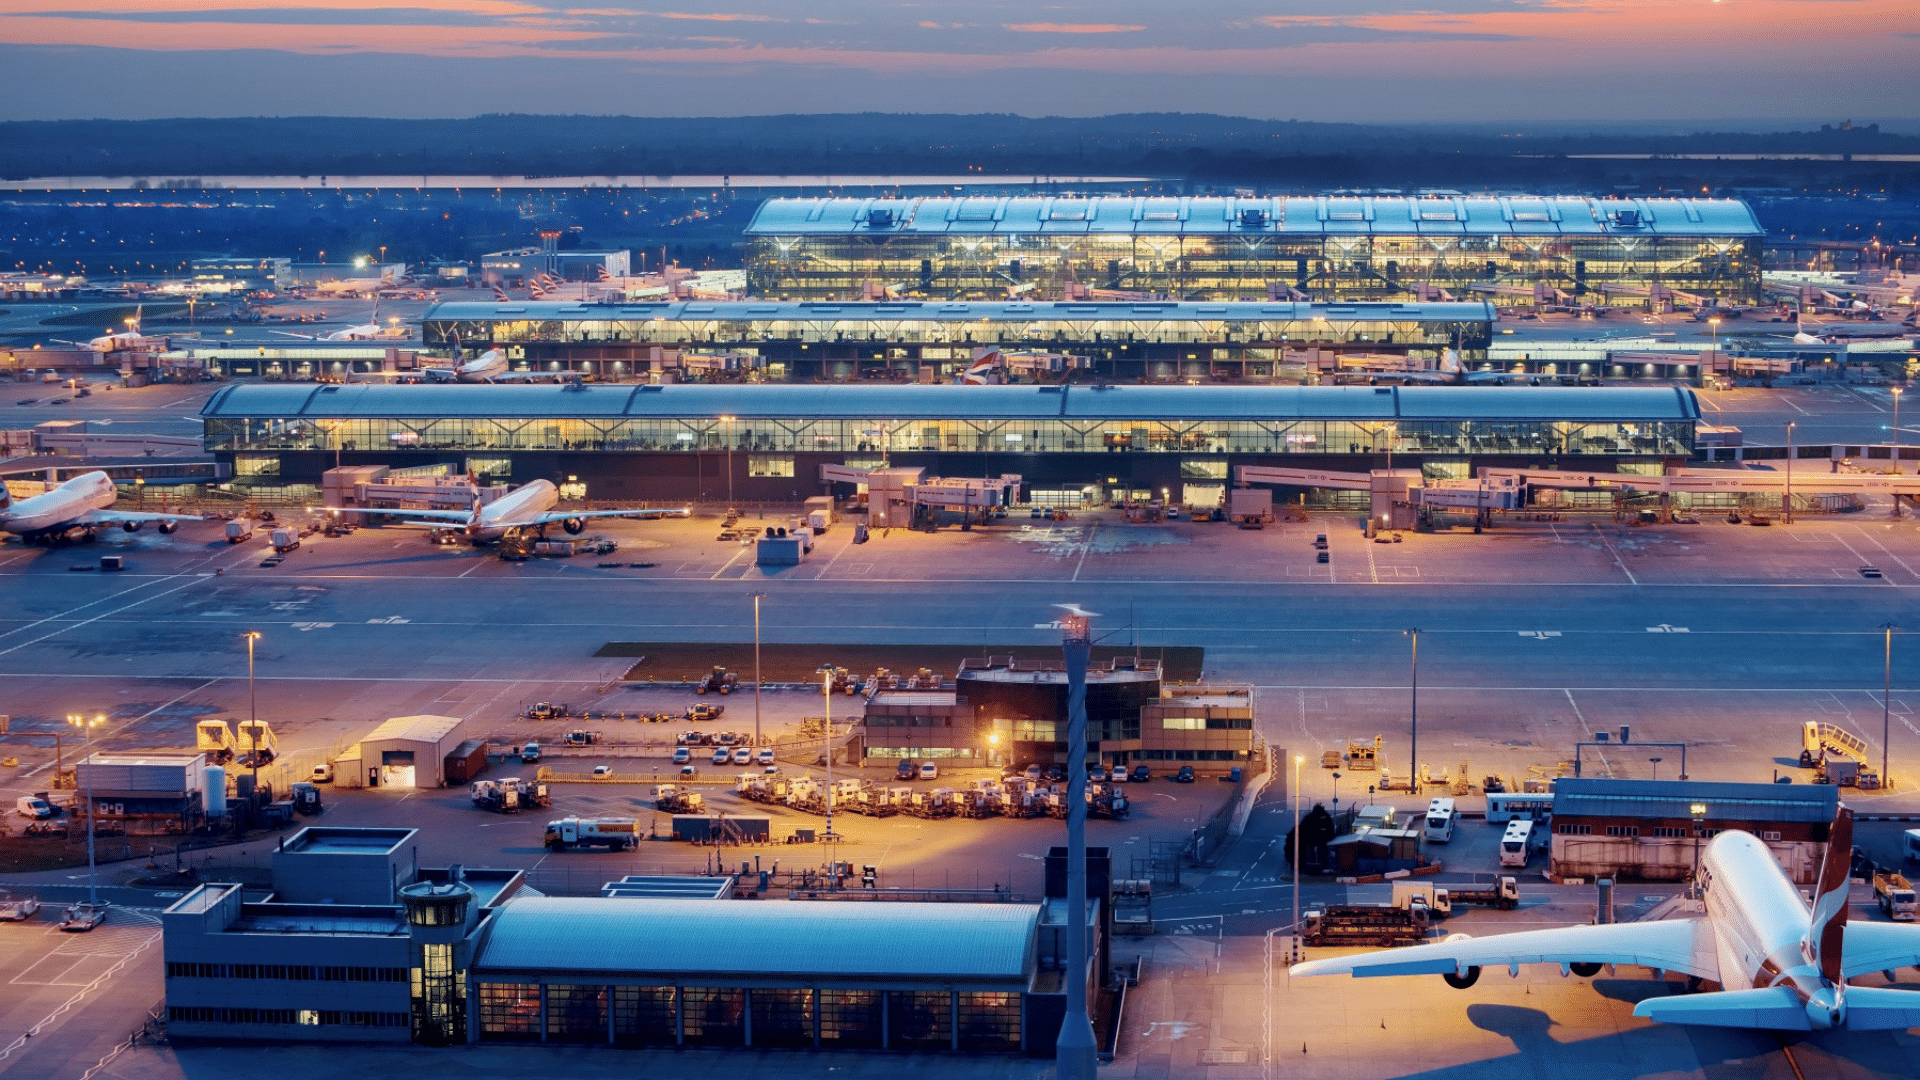 Airport London Heathrow 1